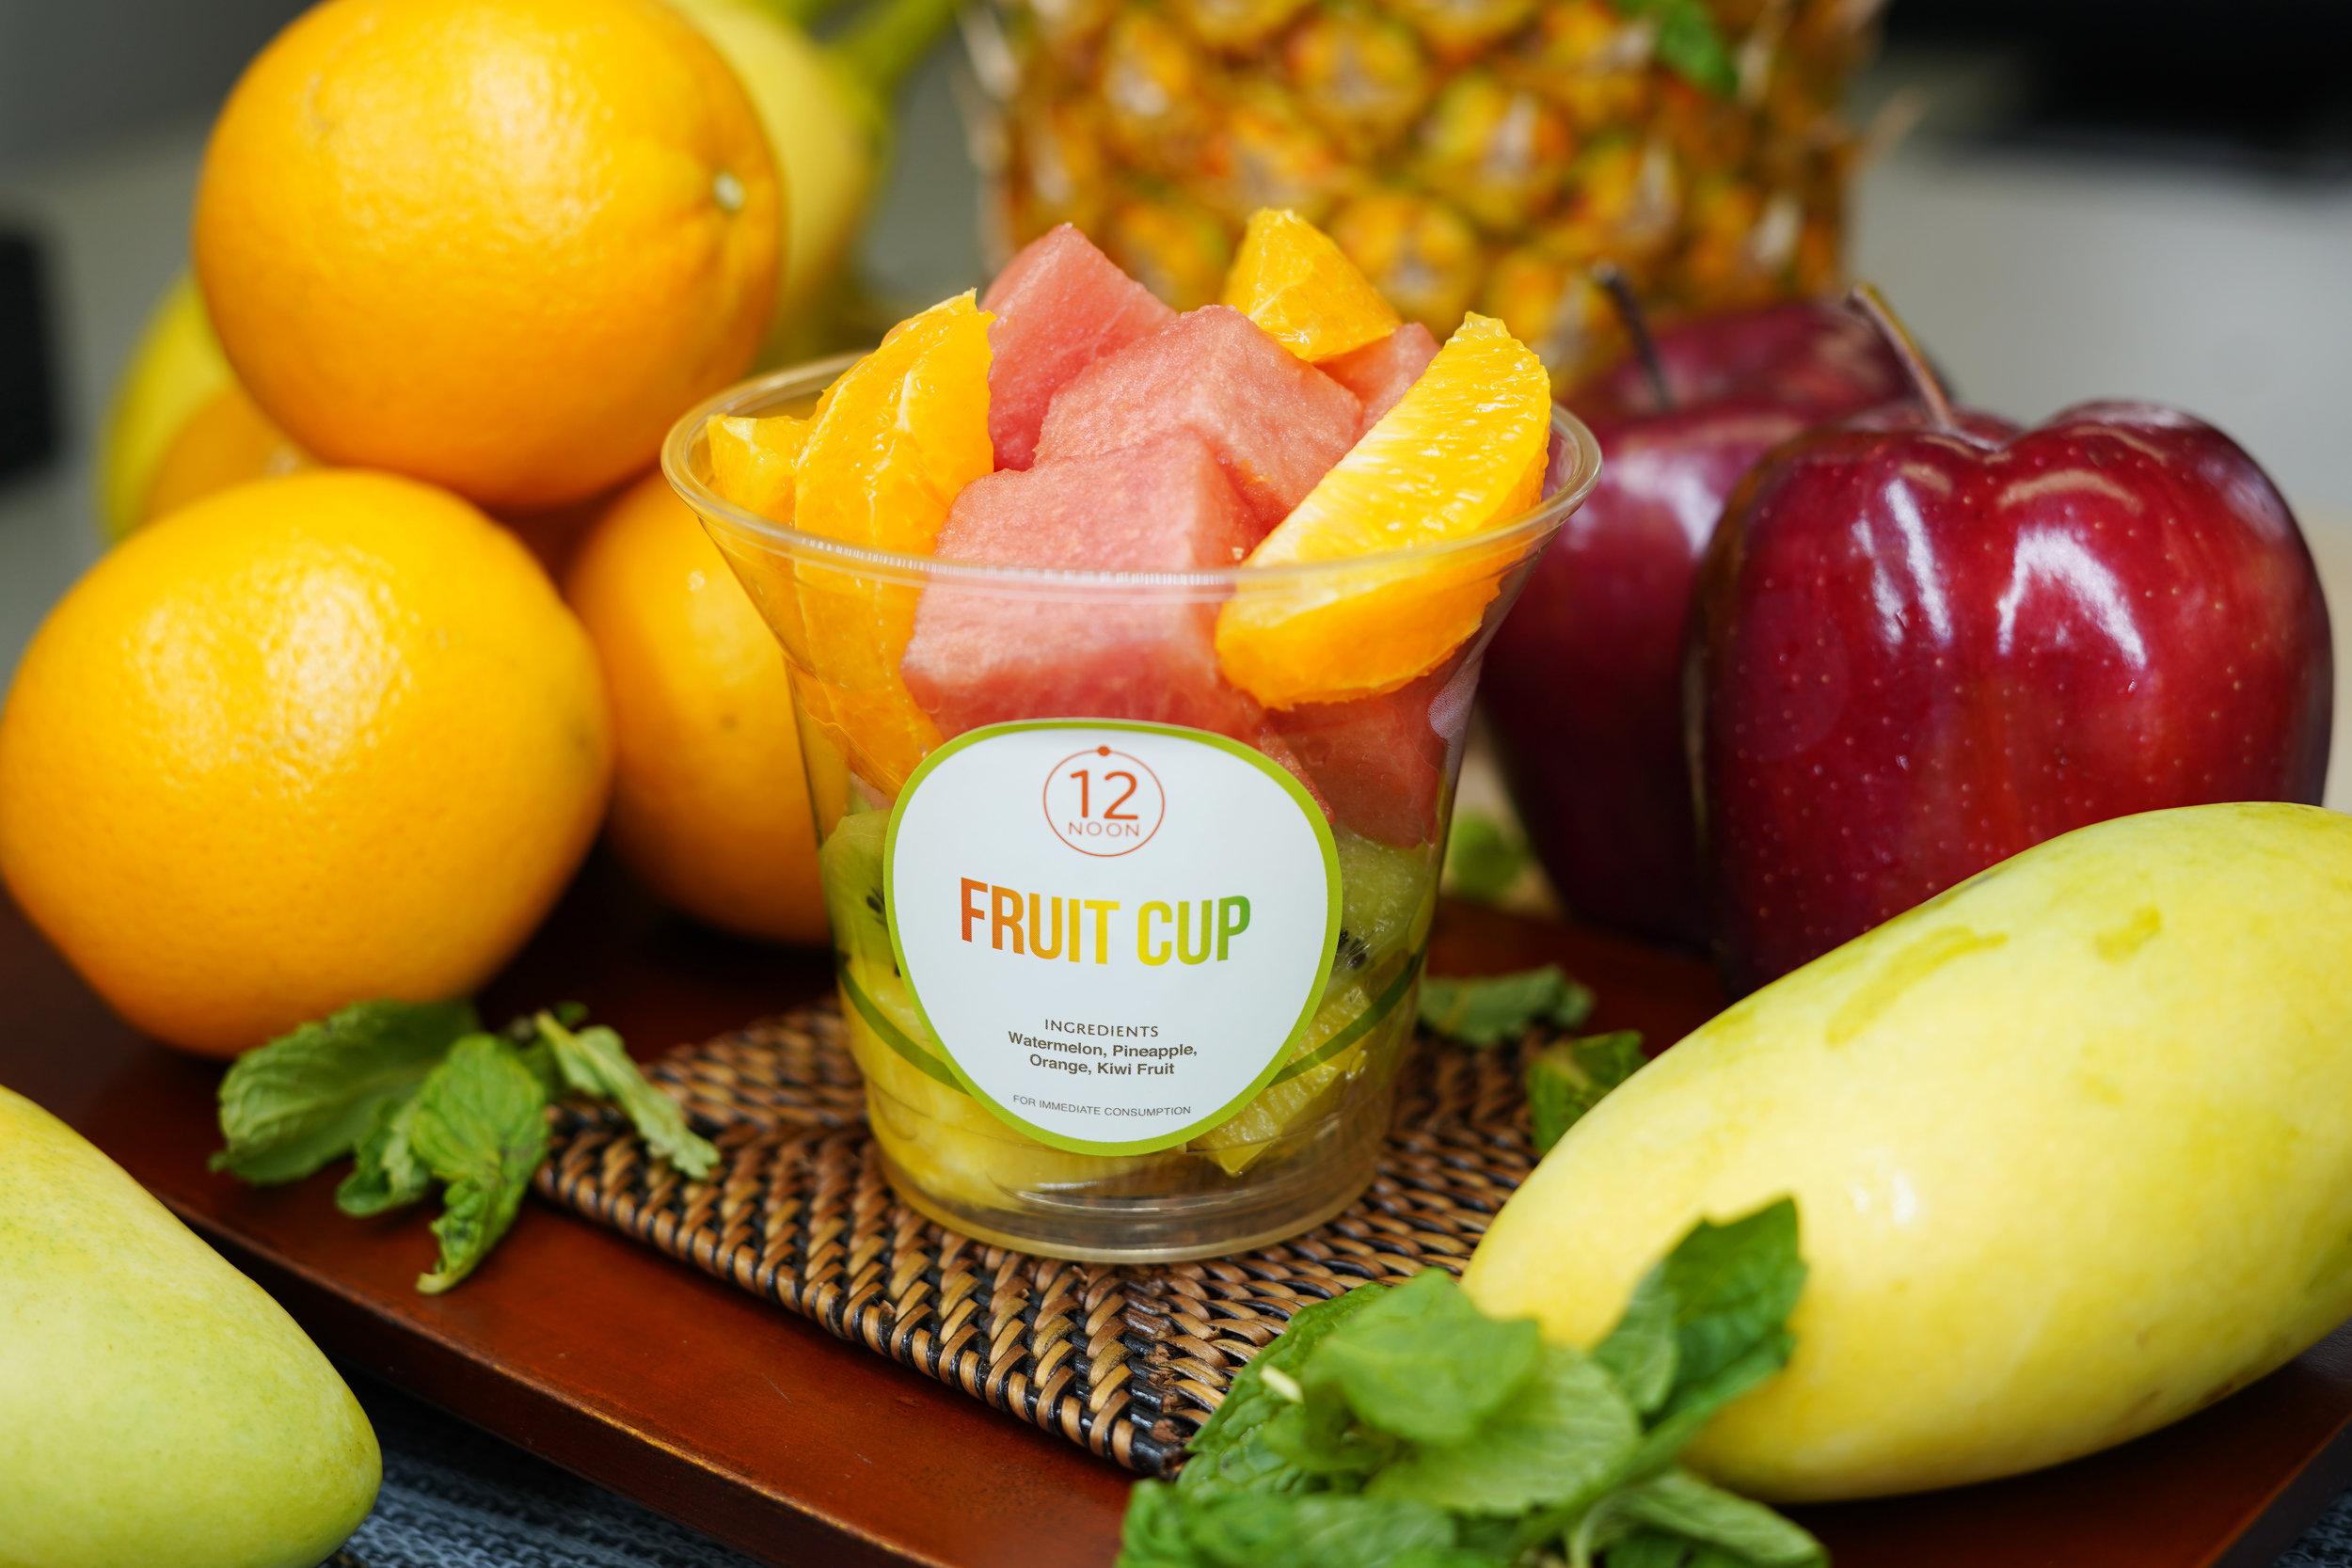 FRUIT CUP - Watermelon, Pineapple, Orange, Kiwi Fruit$25